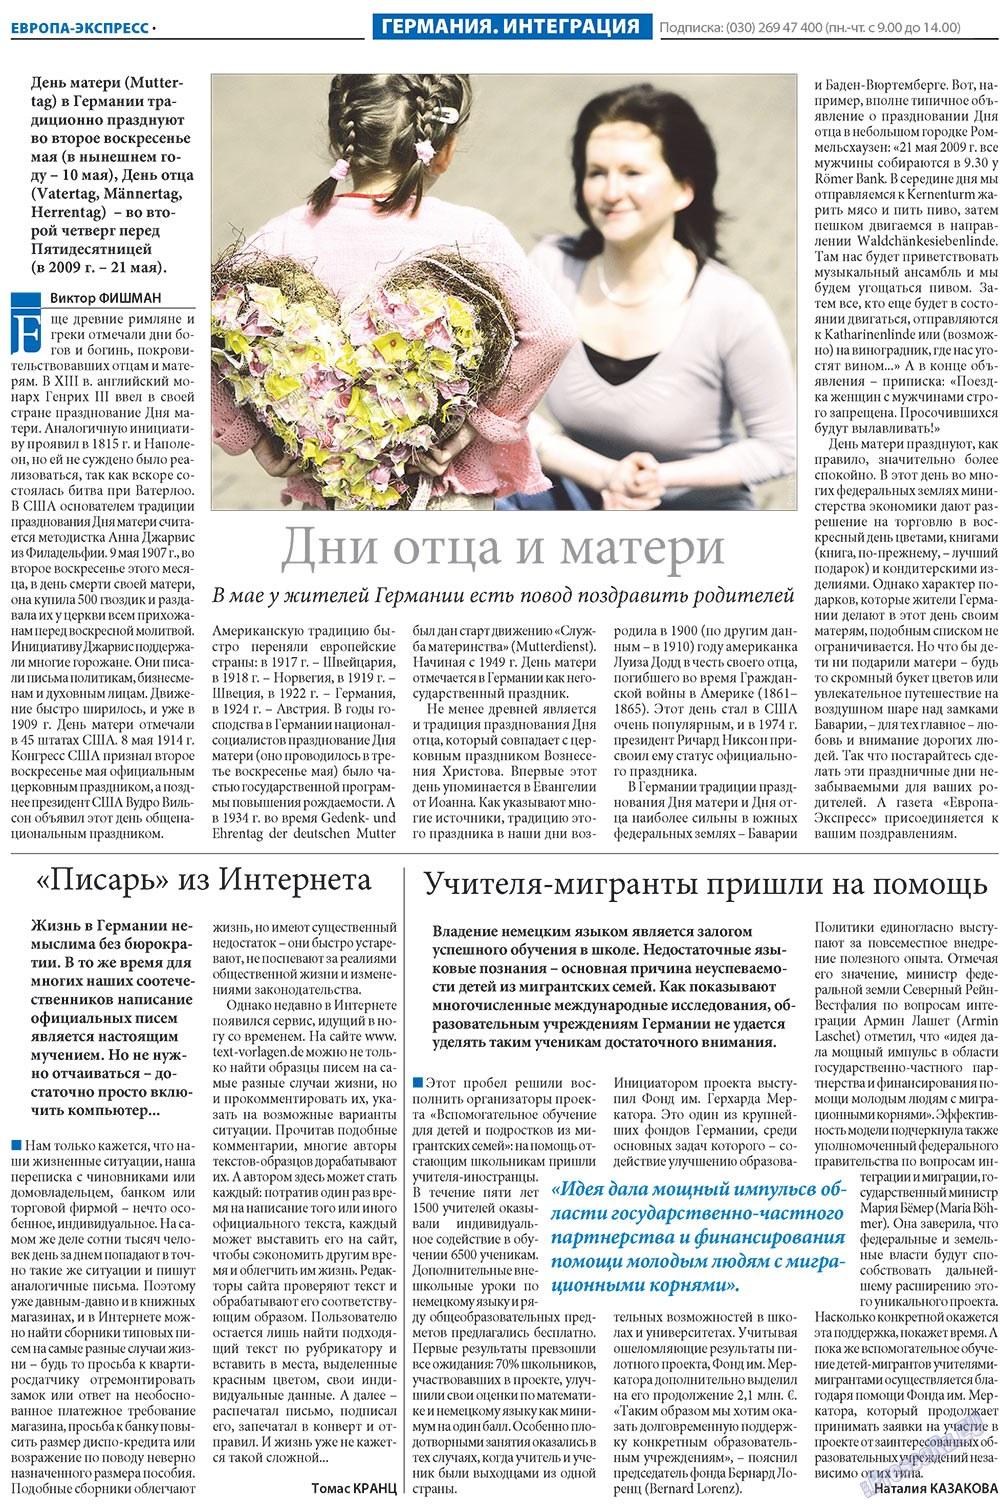 Европа экспресс (газета). 2009 год, номер 19, стр. 5